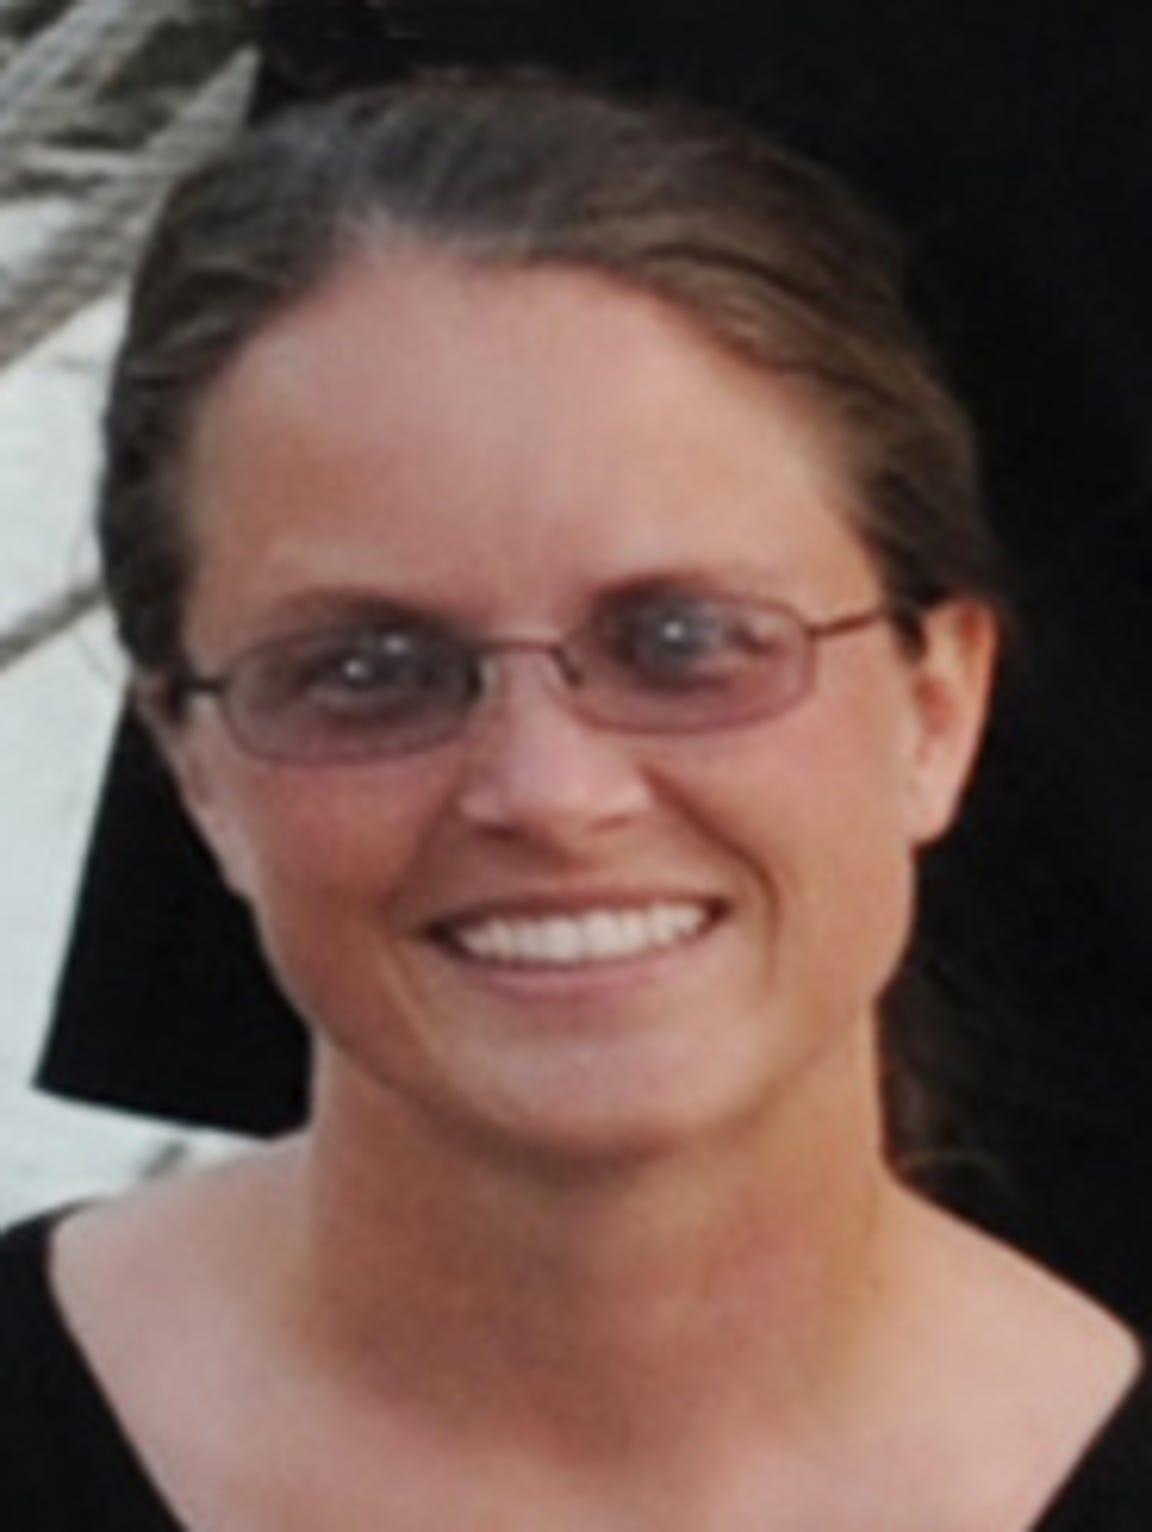 Sarah Gleason of the first-ever all female skipjack